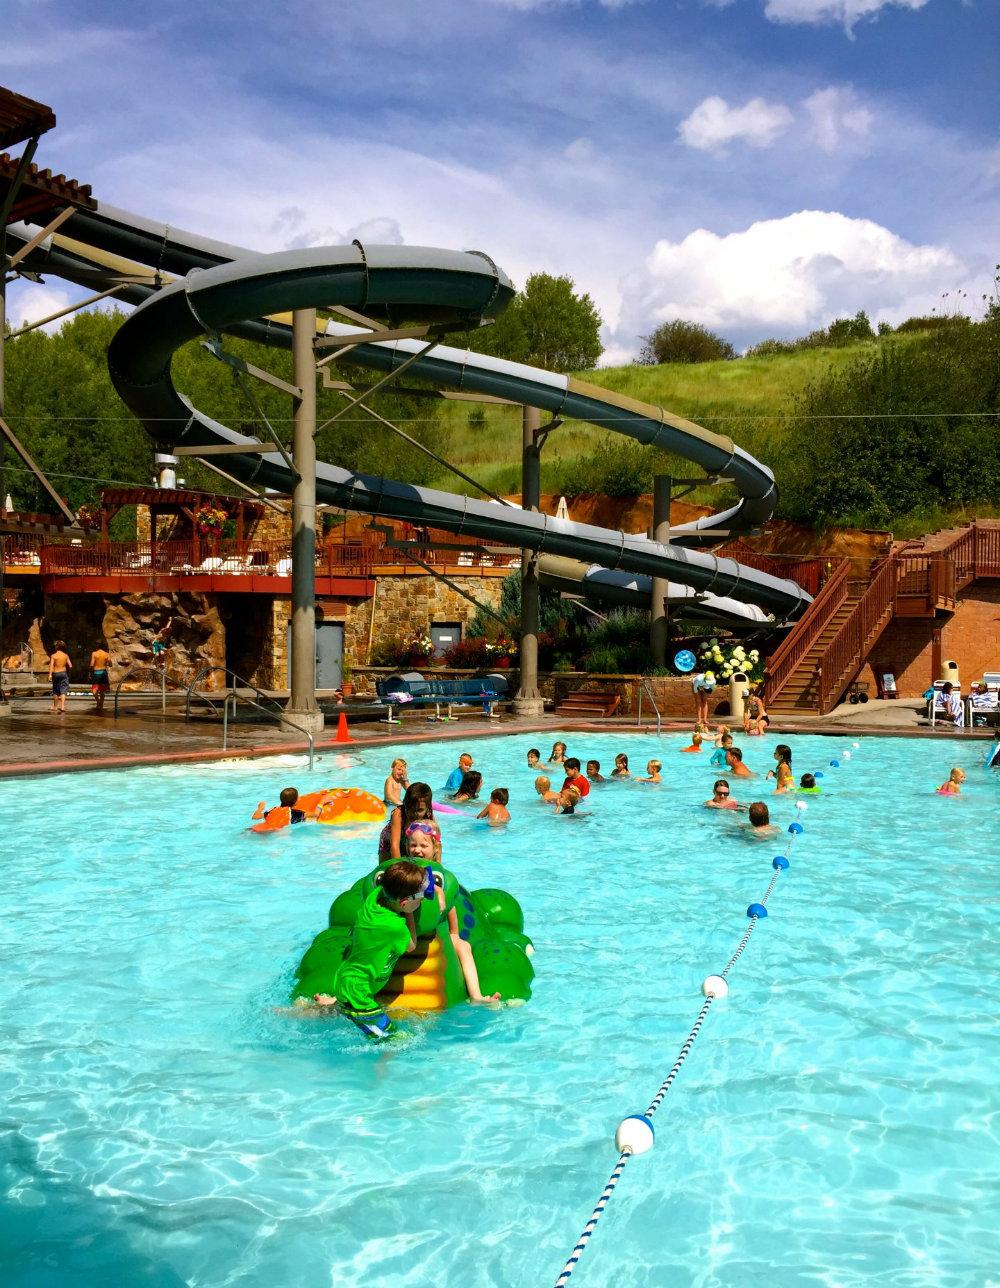 Water slide at Old Town Hot Springs in Steamboat Springs, CO.